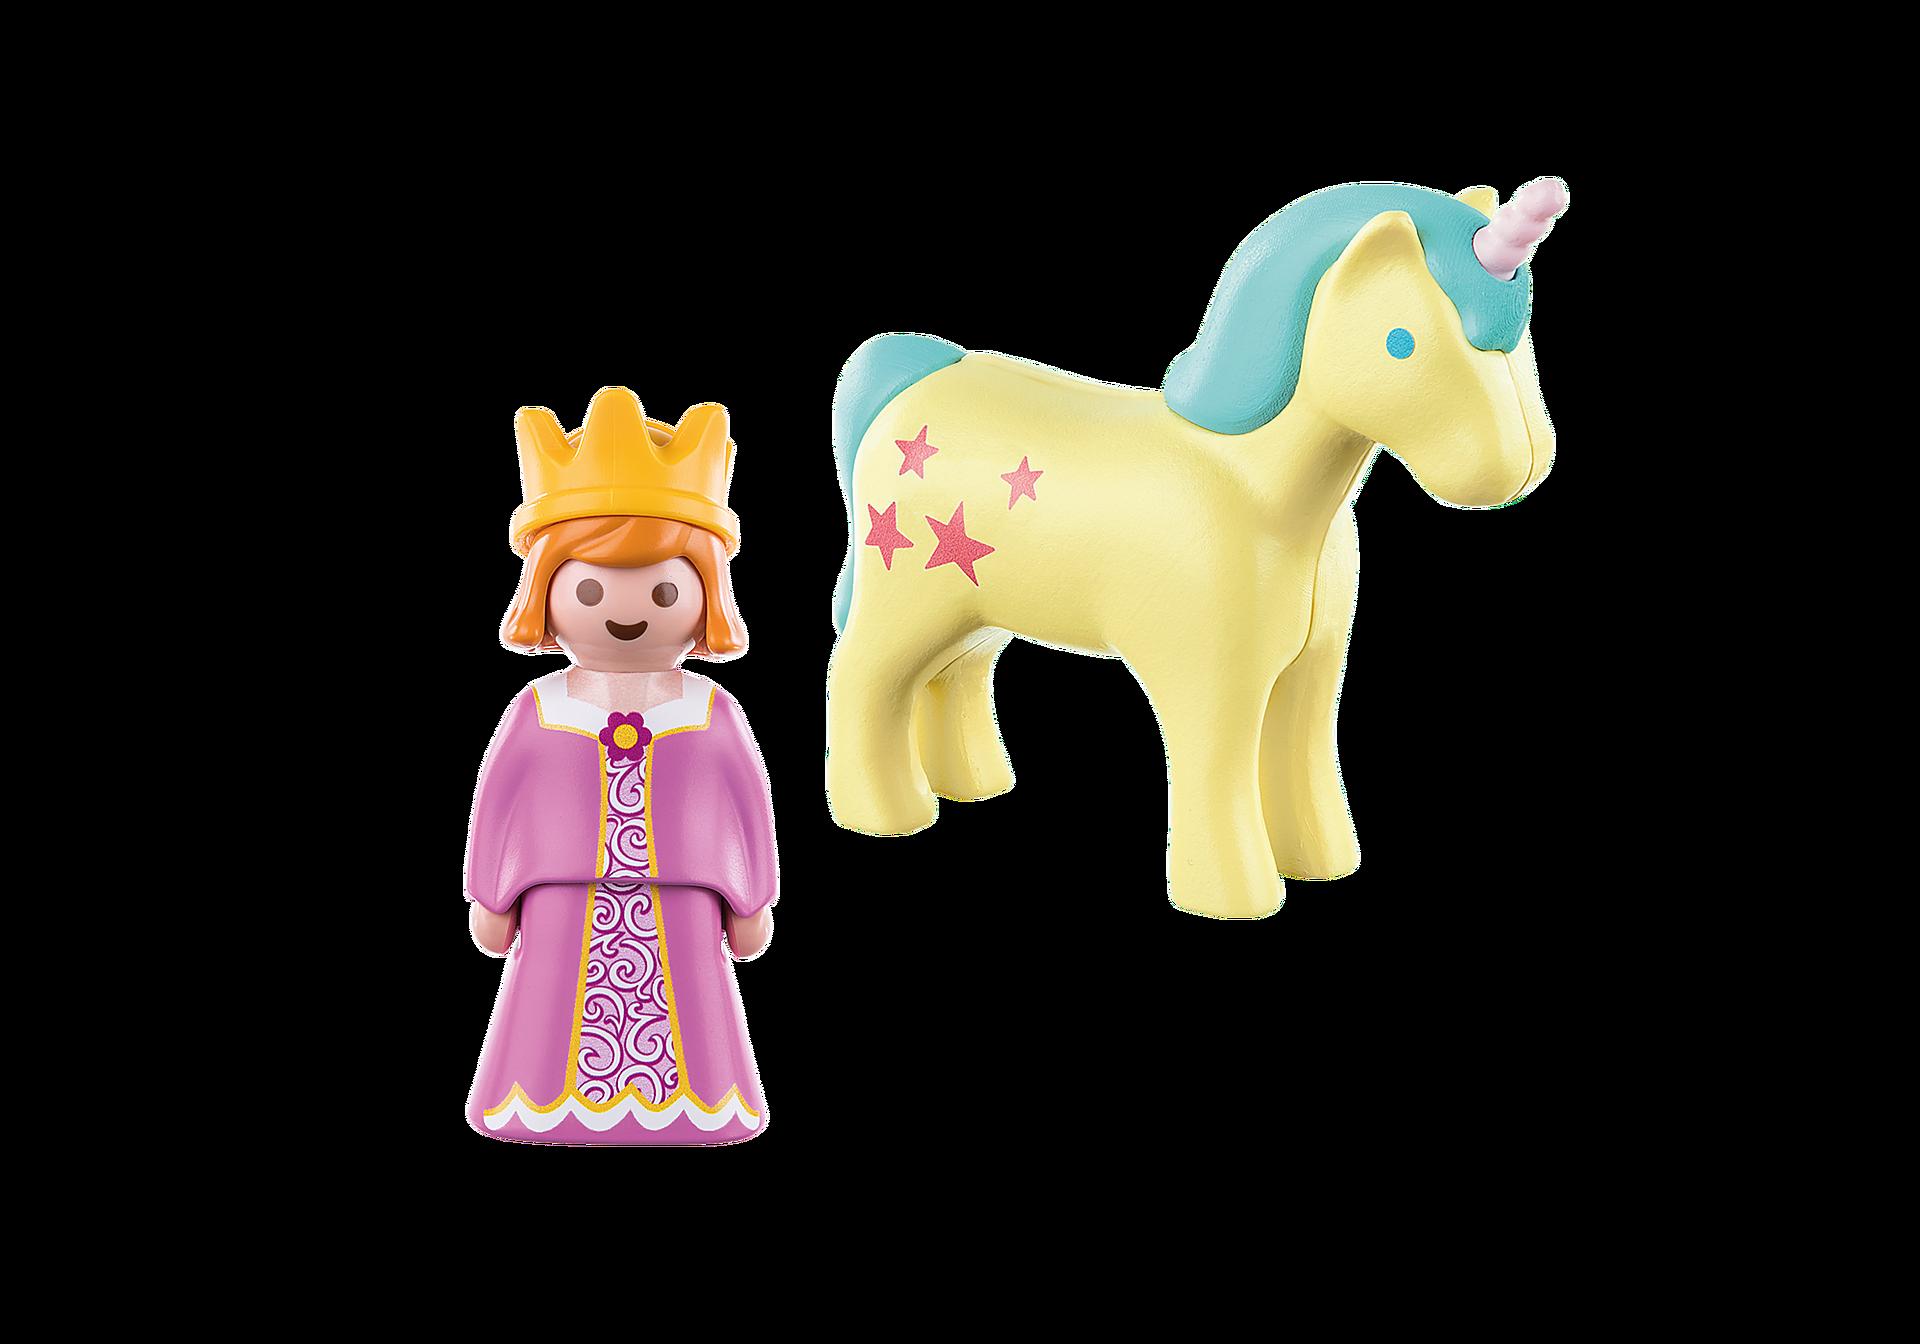 70127 1.2.3 Princesa con Unicornio zoom image3